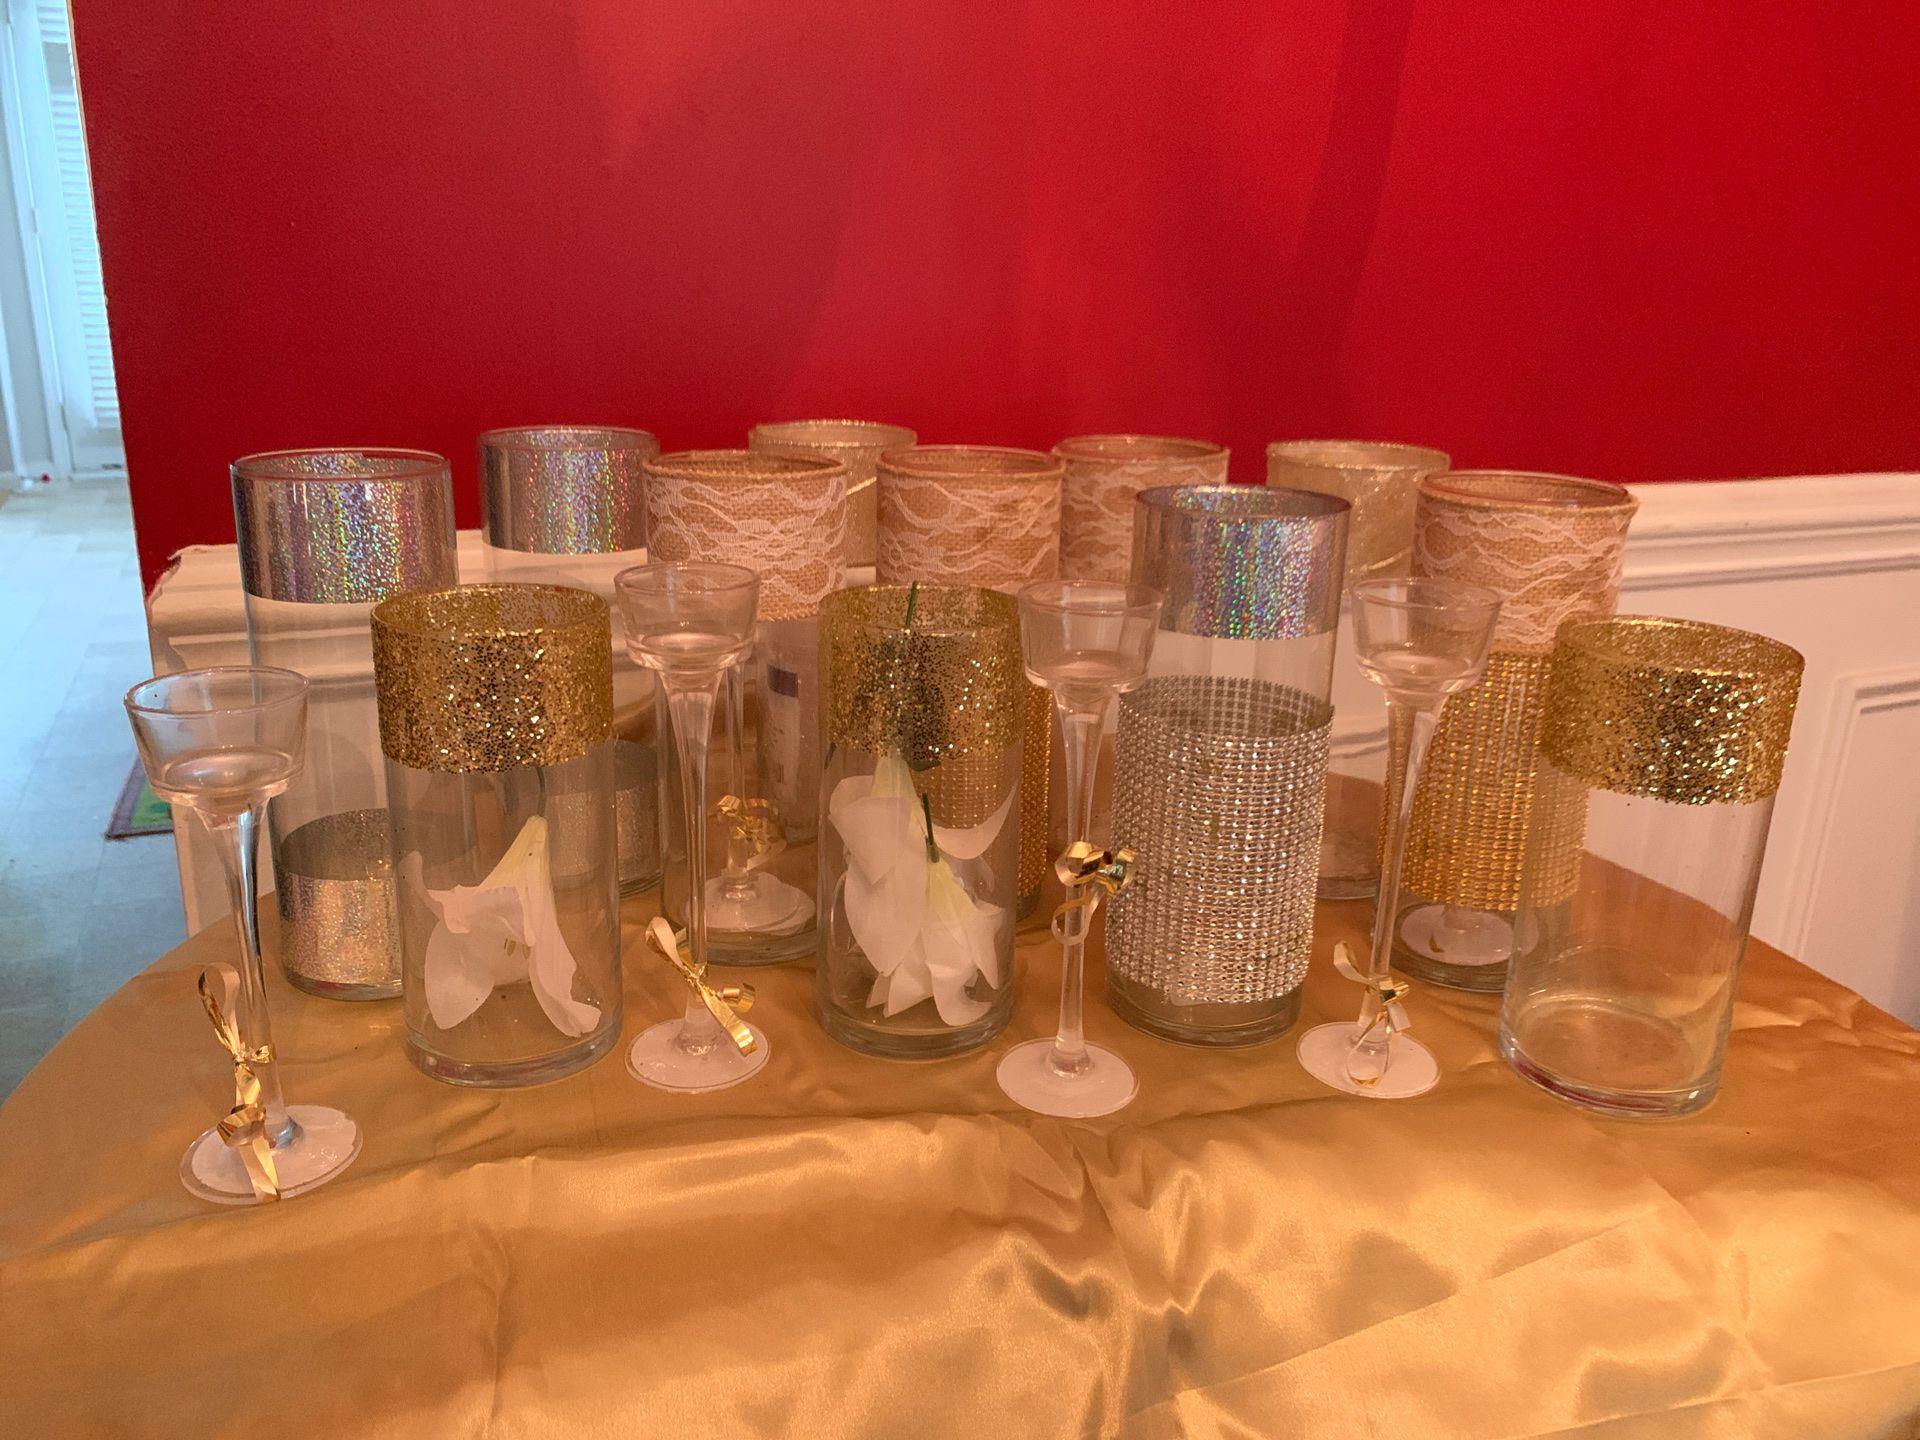 Gorgeous Wedding or Event Centerpieces!